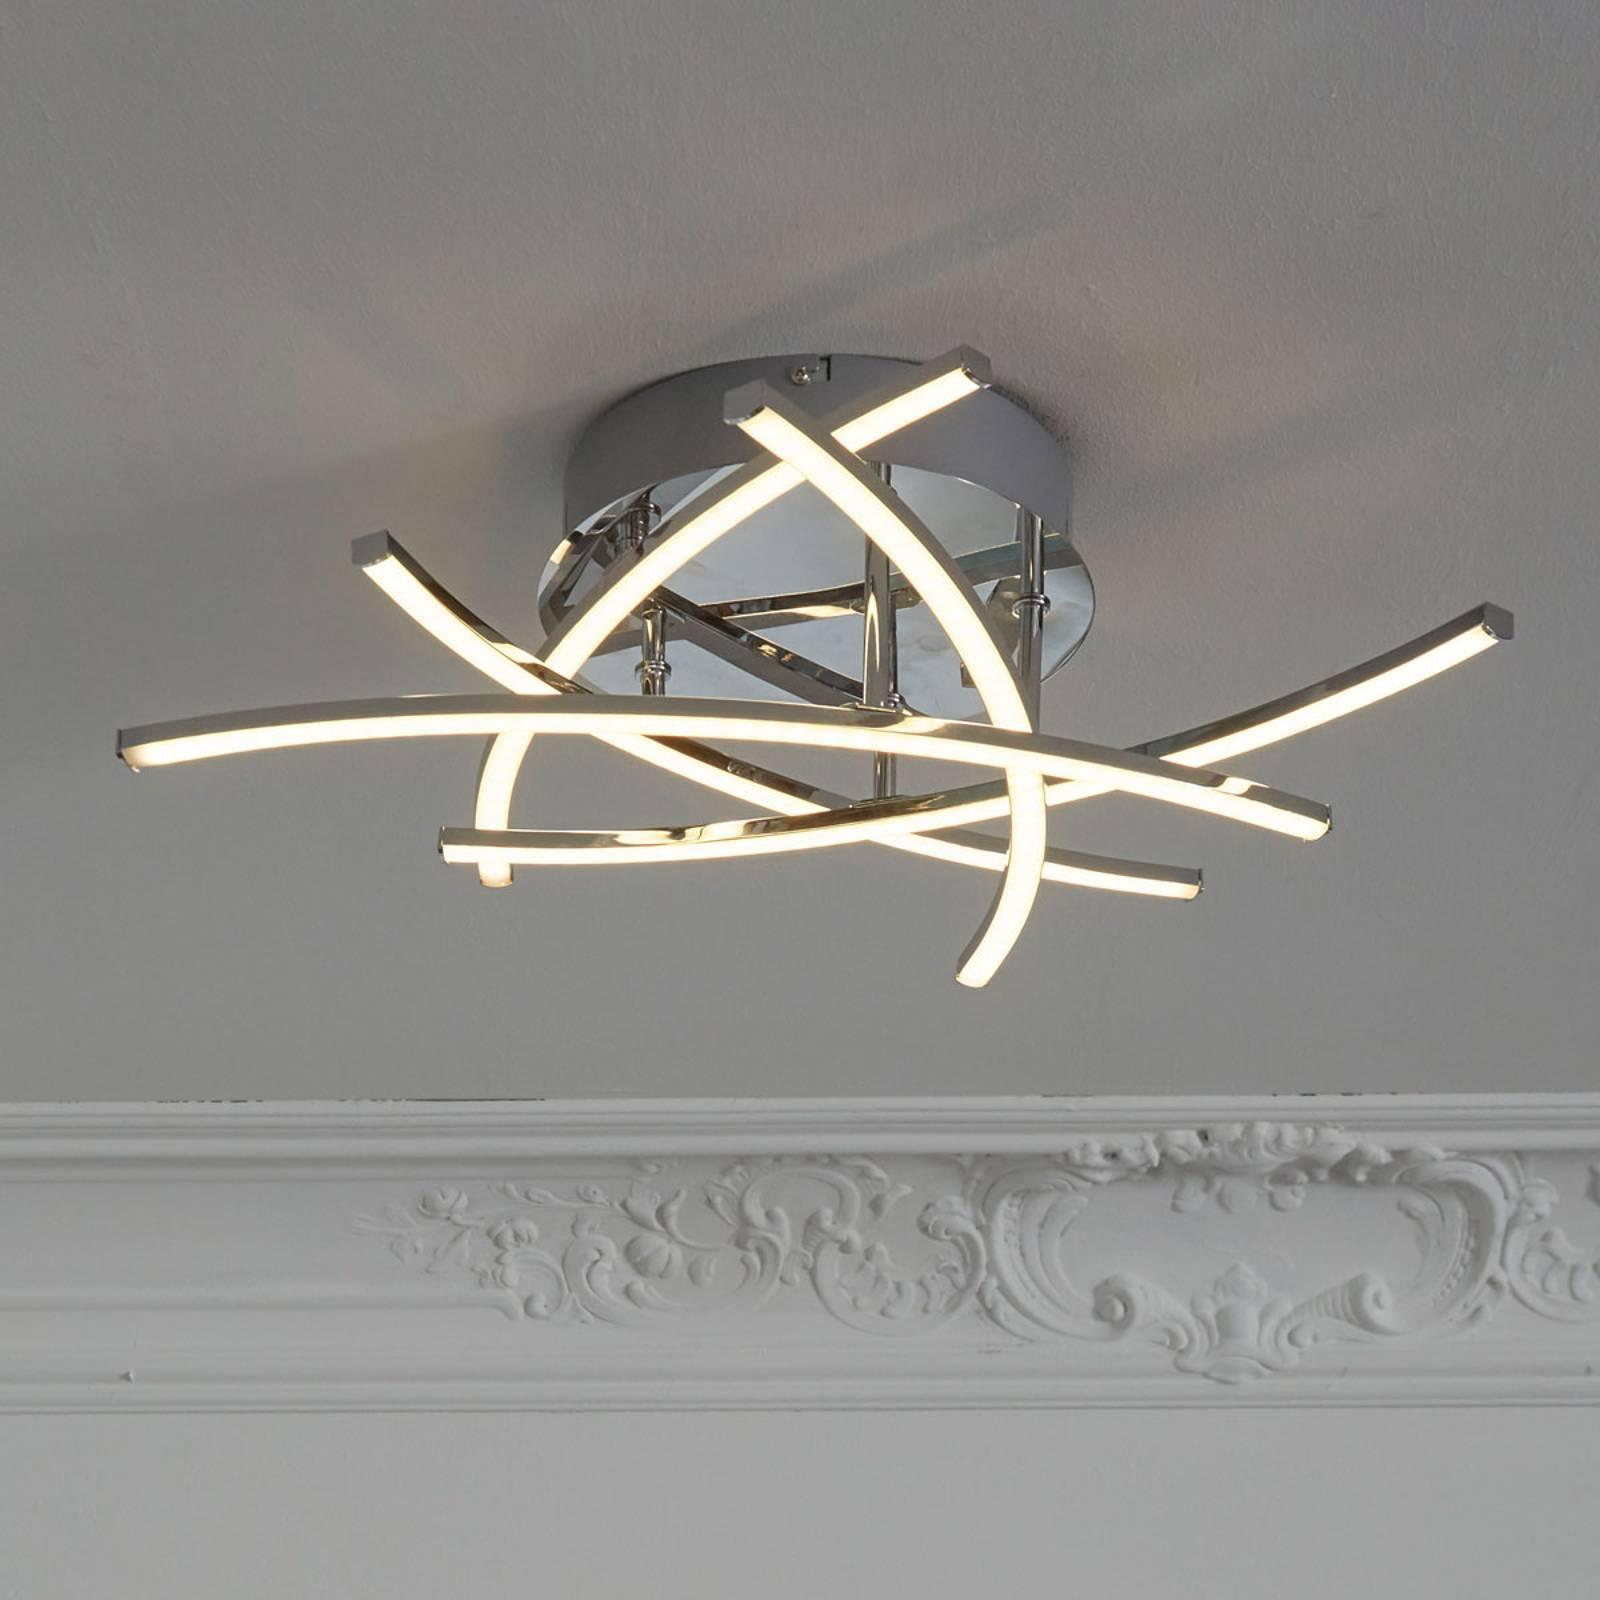 LED plafondlamp Cross tunable white, 5 lamp, chr